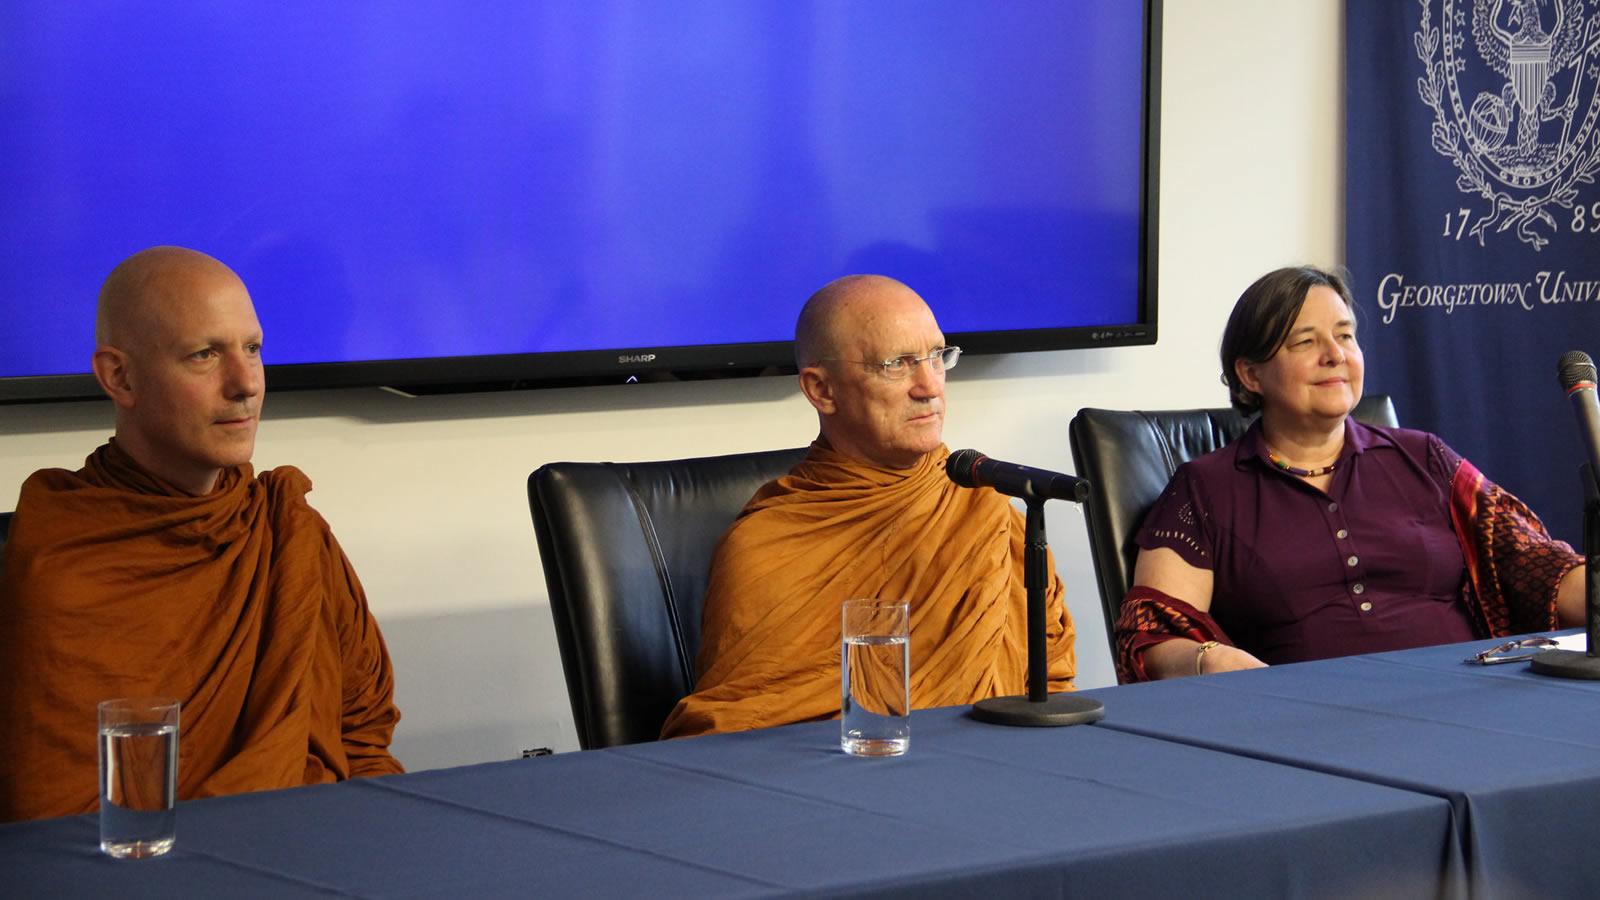 Ajahn Jayanto Bhikku, Ajahn Pasanno Bhikku, and Katherine Marshall listen to an audience question.